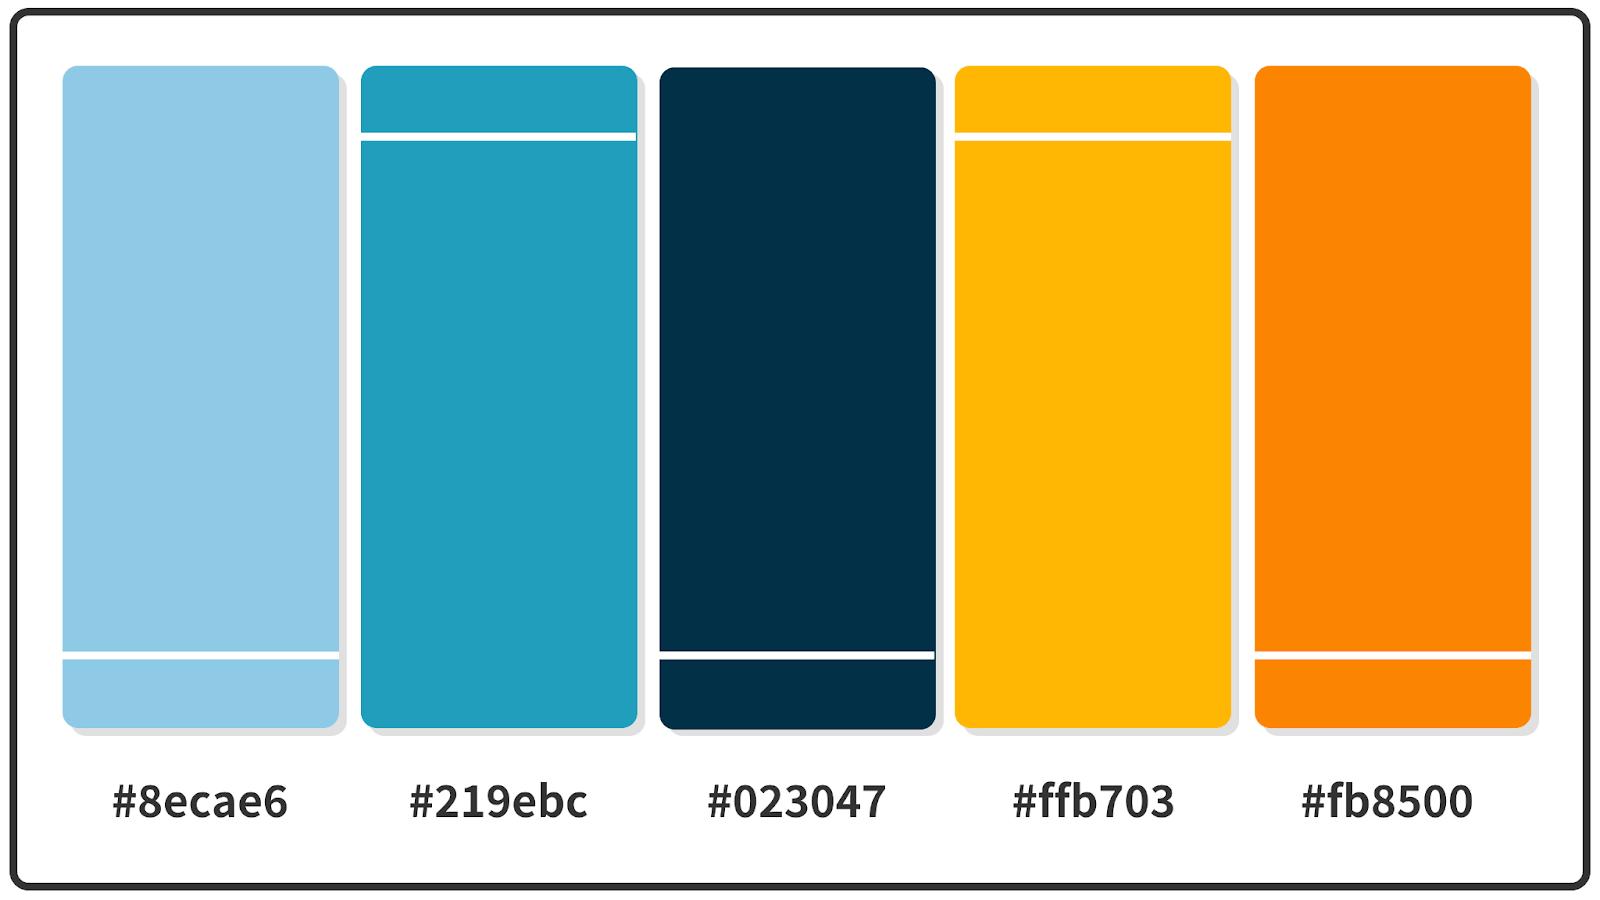 Orange + Honey Yellow + Prussian Blue Color Palette